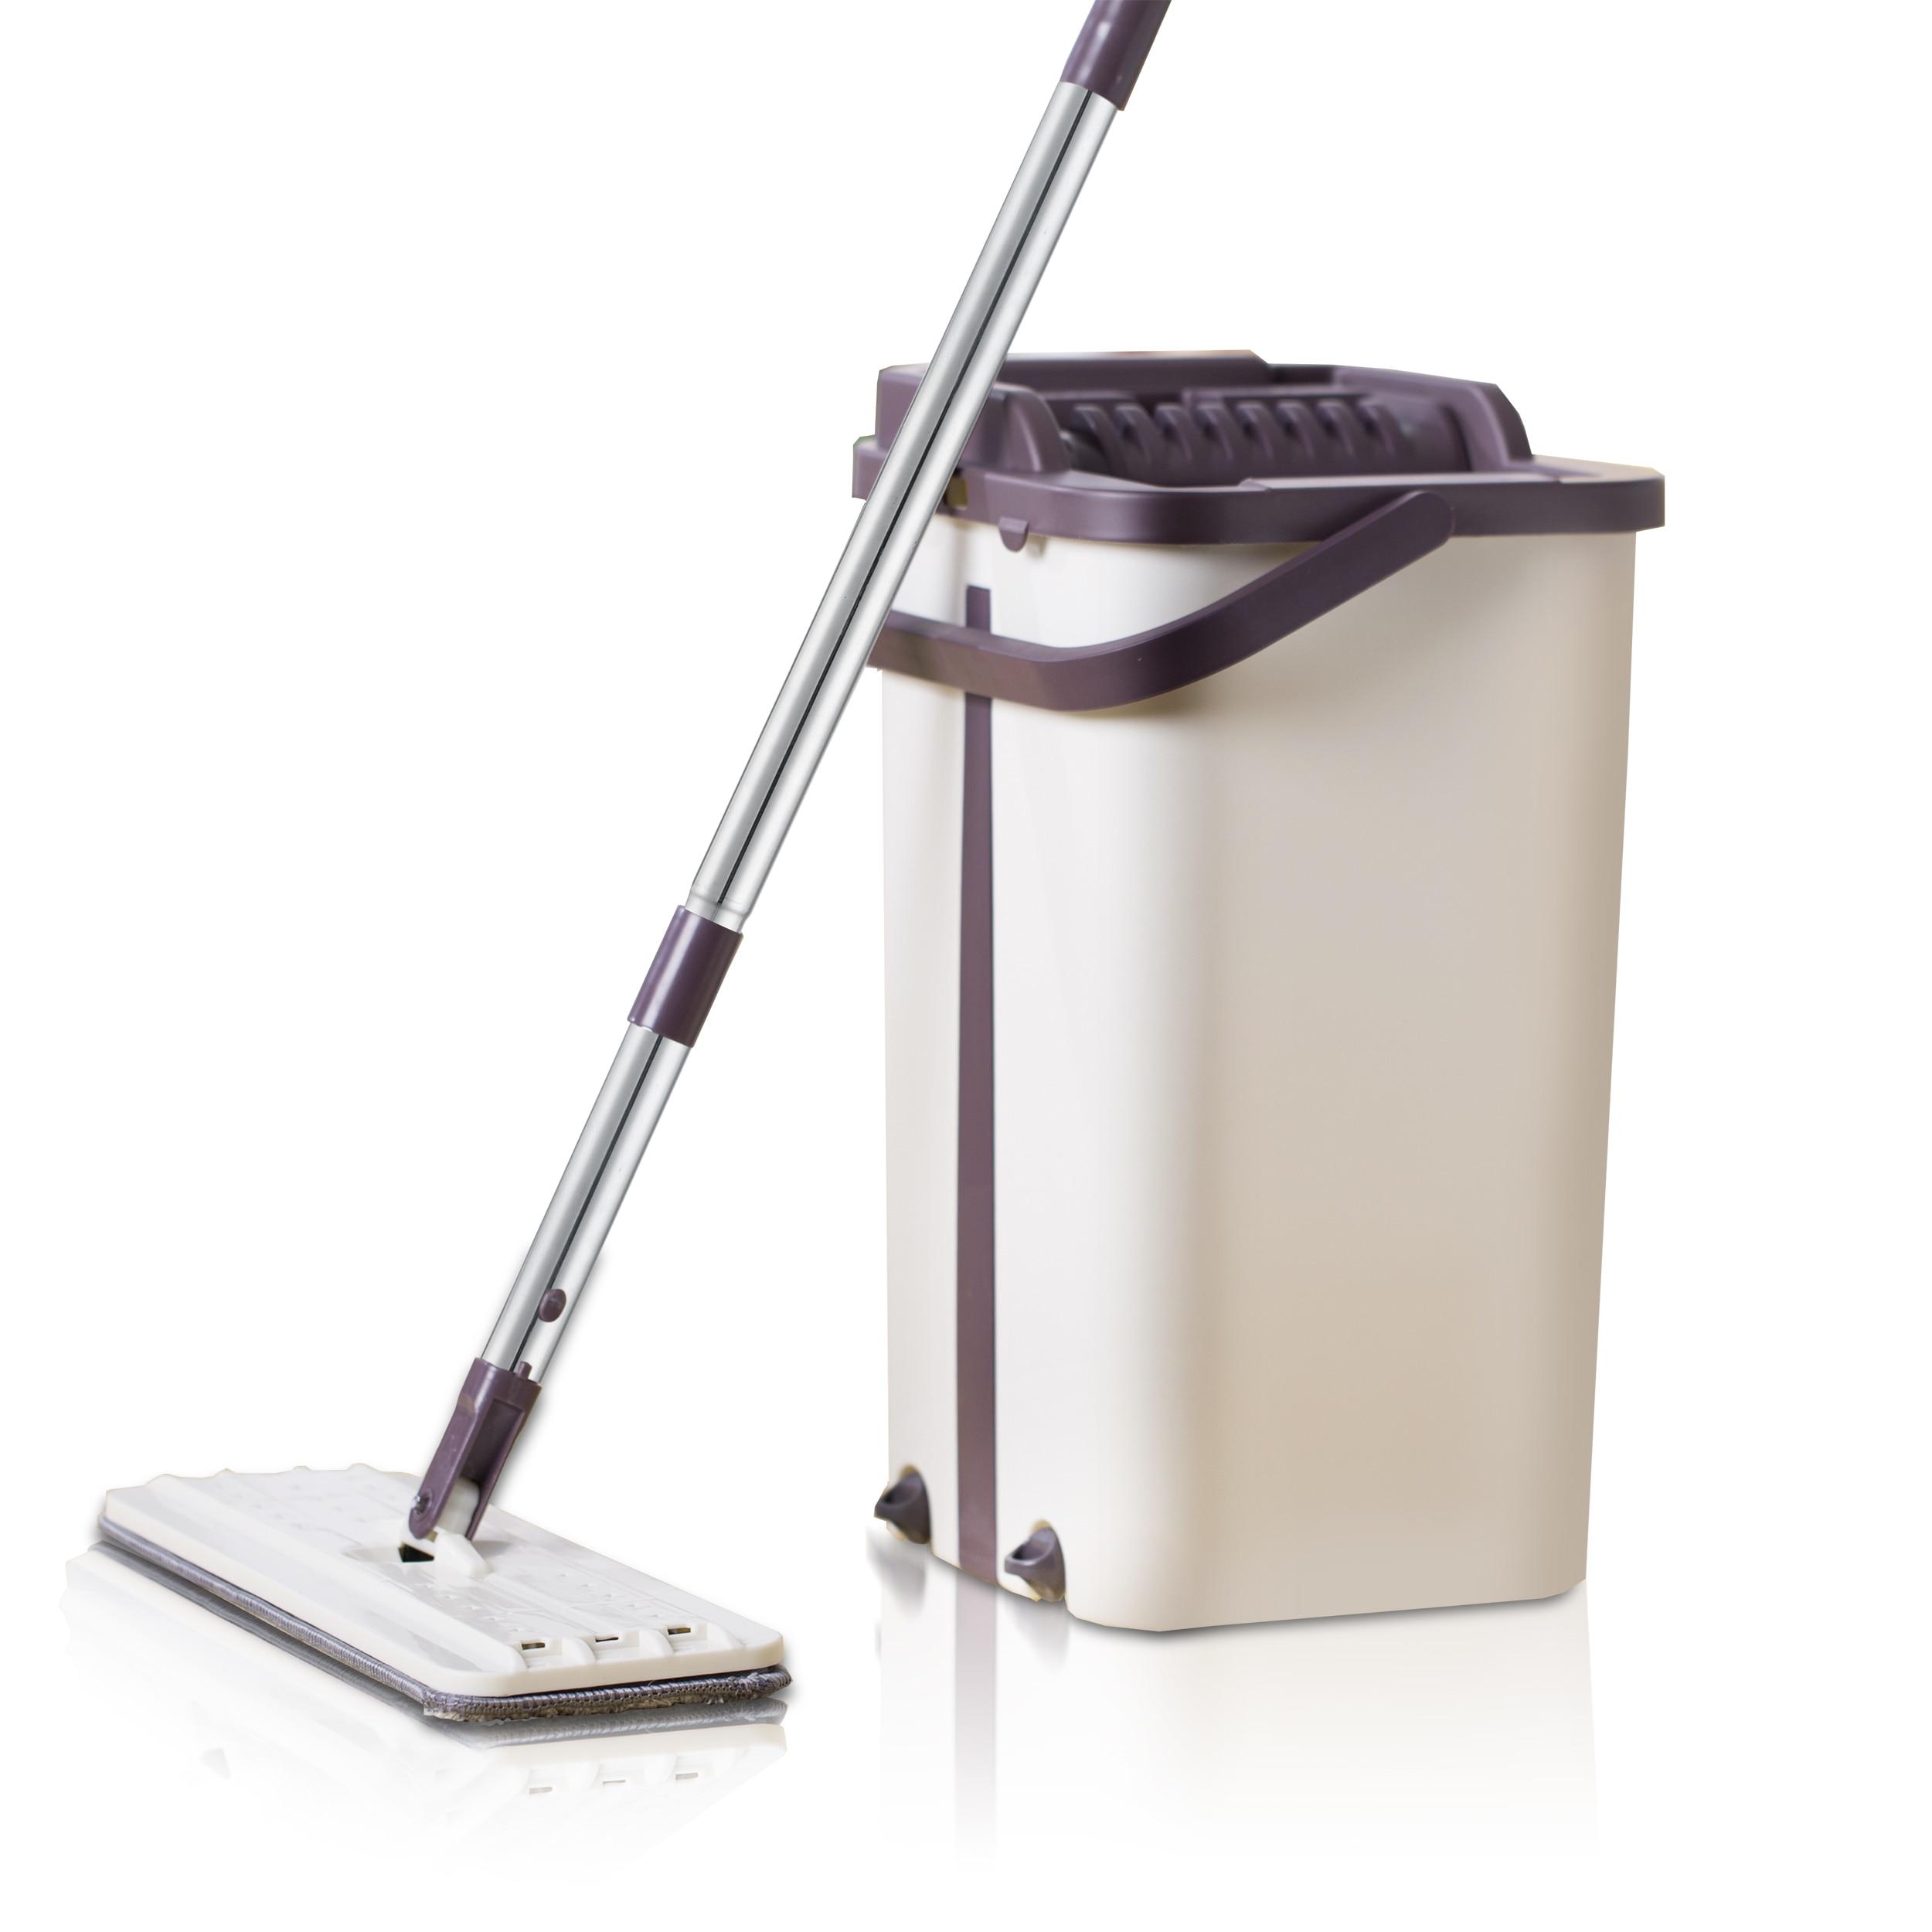 Fregona SDARISB Magic Cleaning Mops Free Hand Spin Mop con cubo de fibra de tela suelos Squeeze Spray fregona plana hogar cocina limpiador de piso